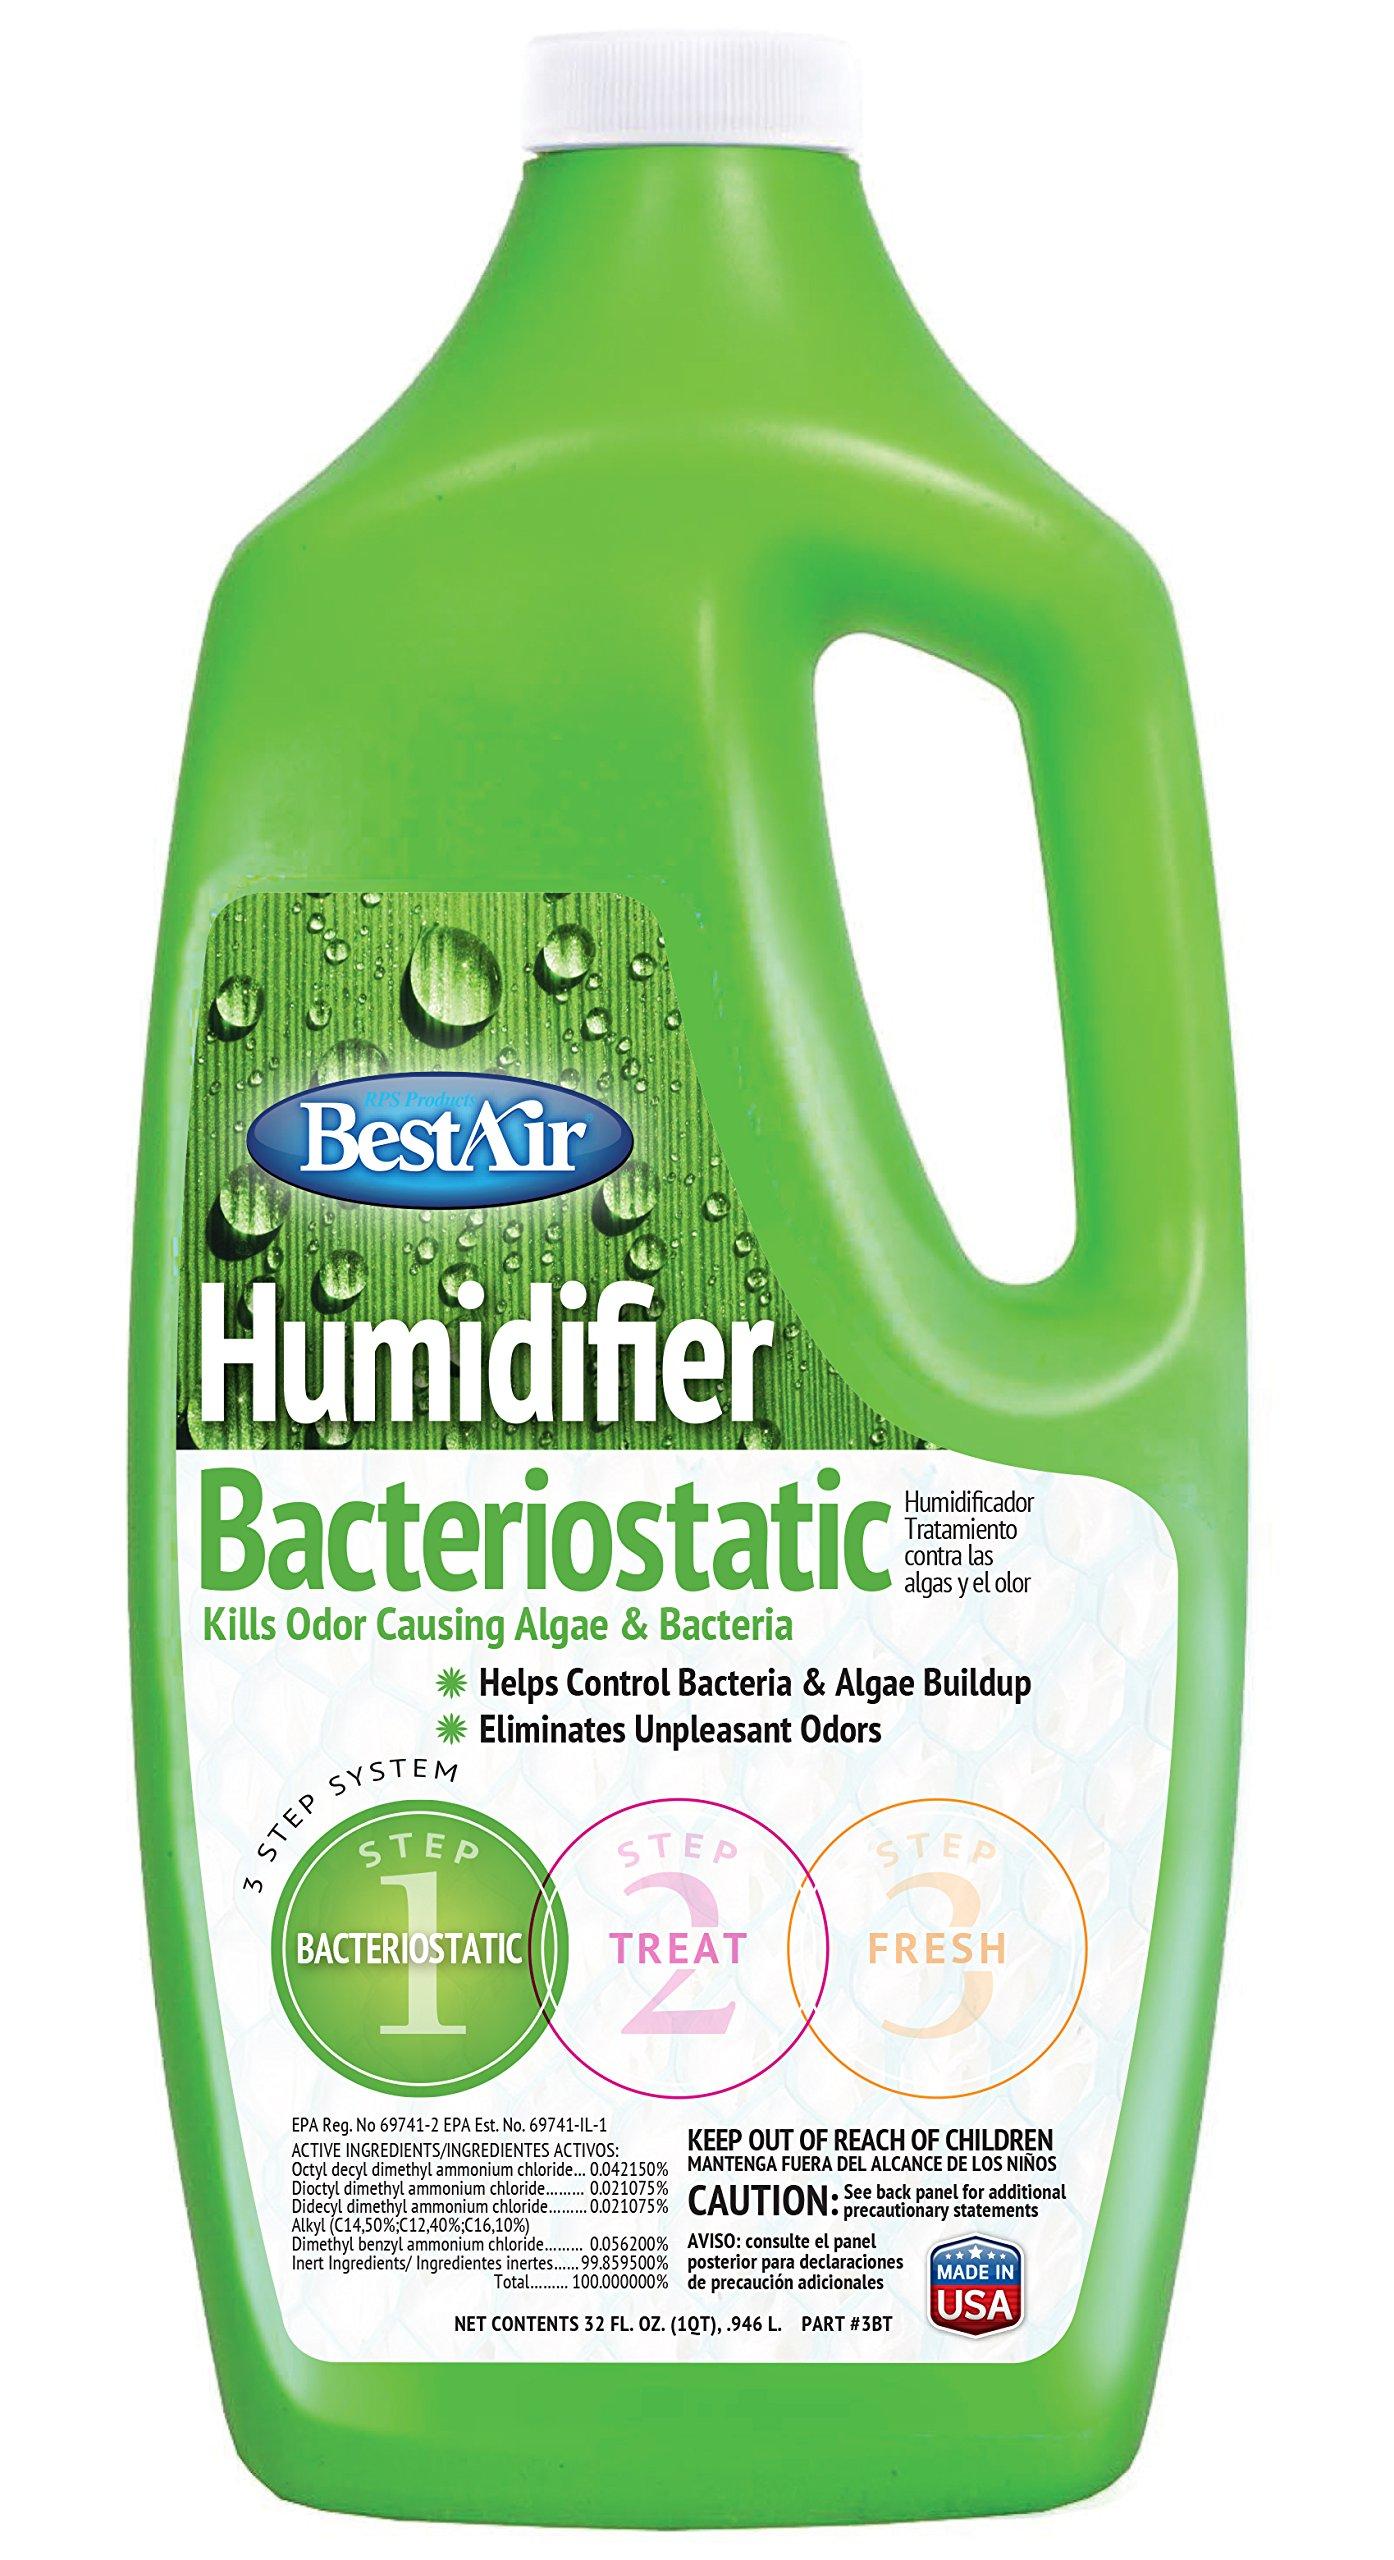 BestAir 3BT, Original BT Humidifier Bacteriostatic Water Treatment, 32 oz, 6 pack by BestAir